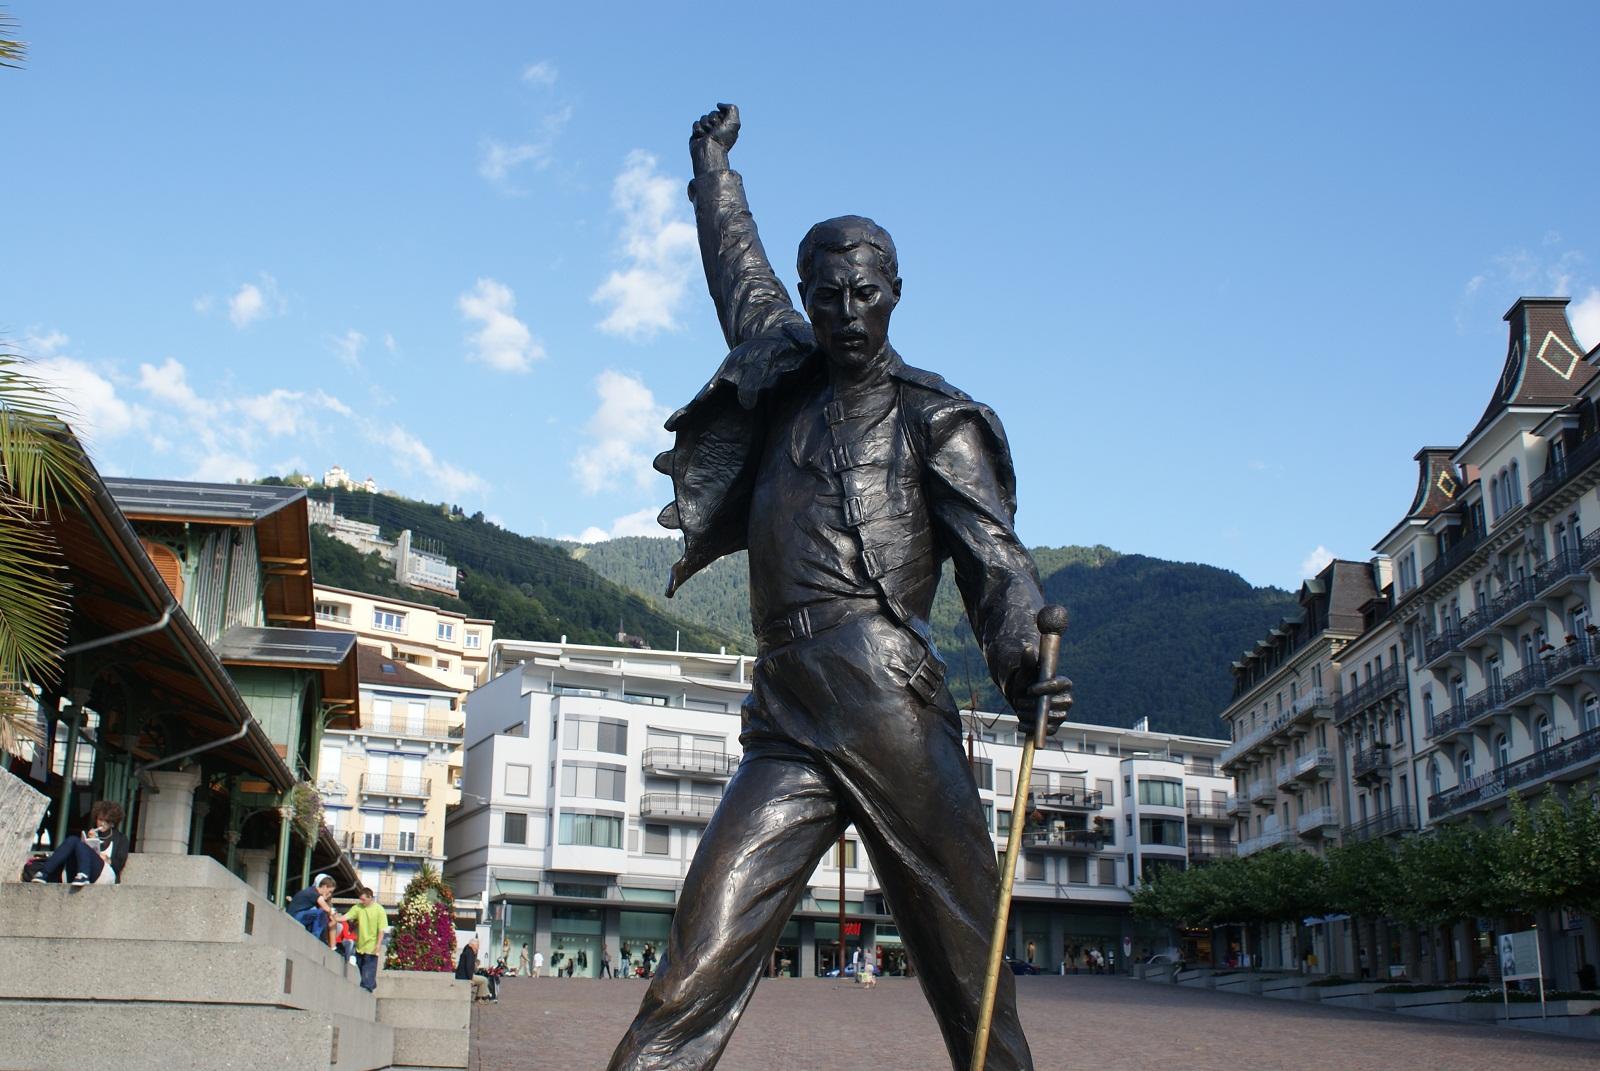 Montreux Switzerland  city images : Montreux, Switzerland, Europe, Freddy Mercury statue